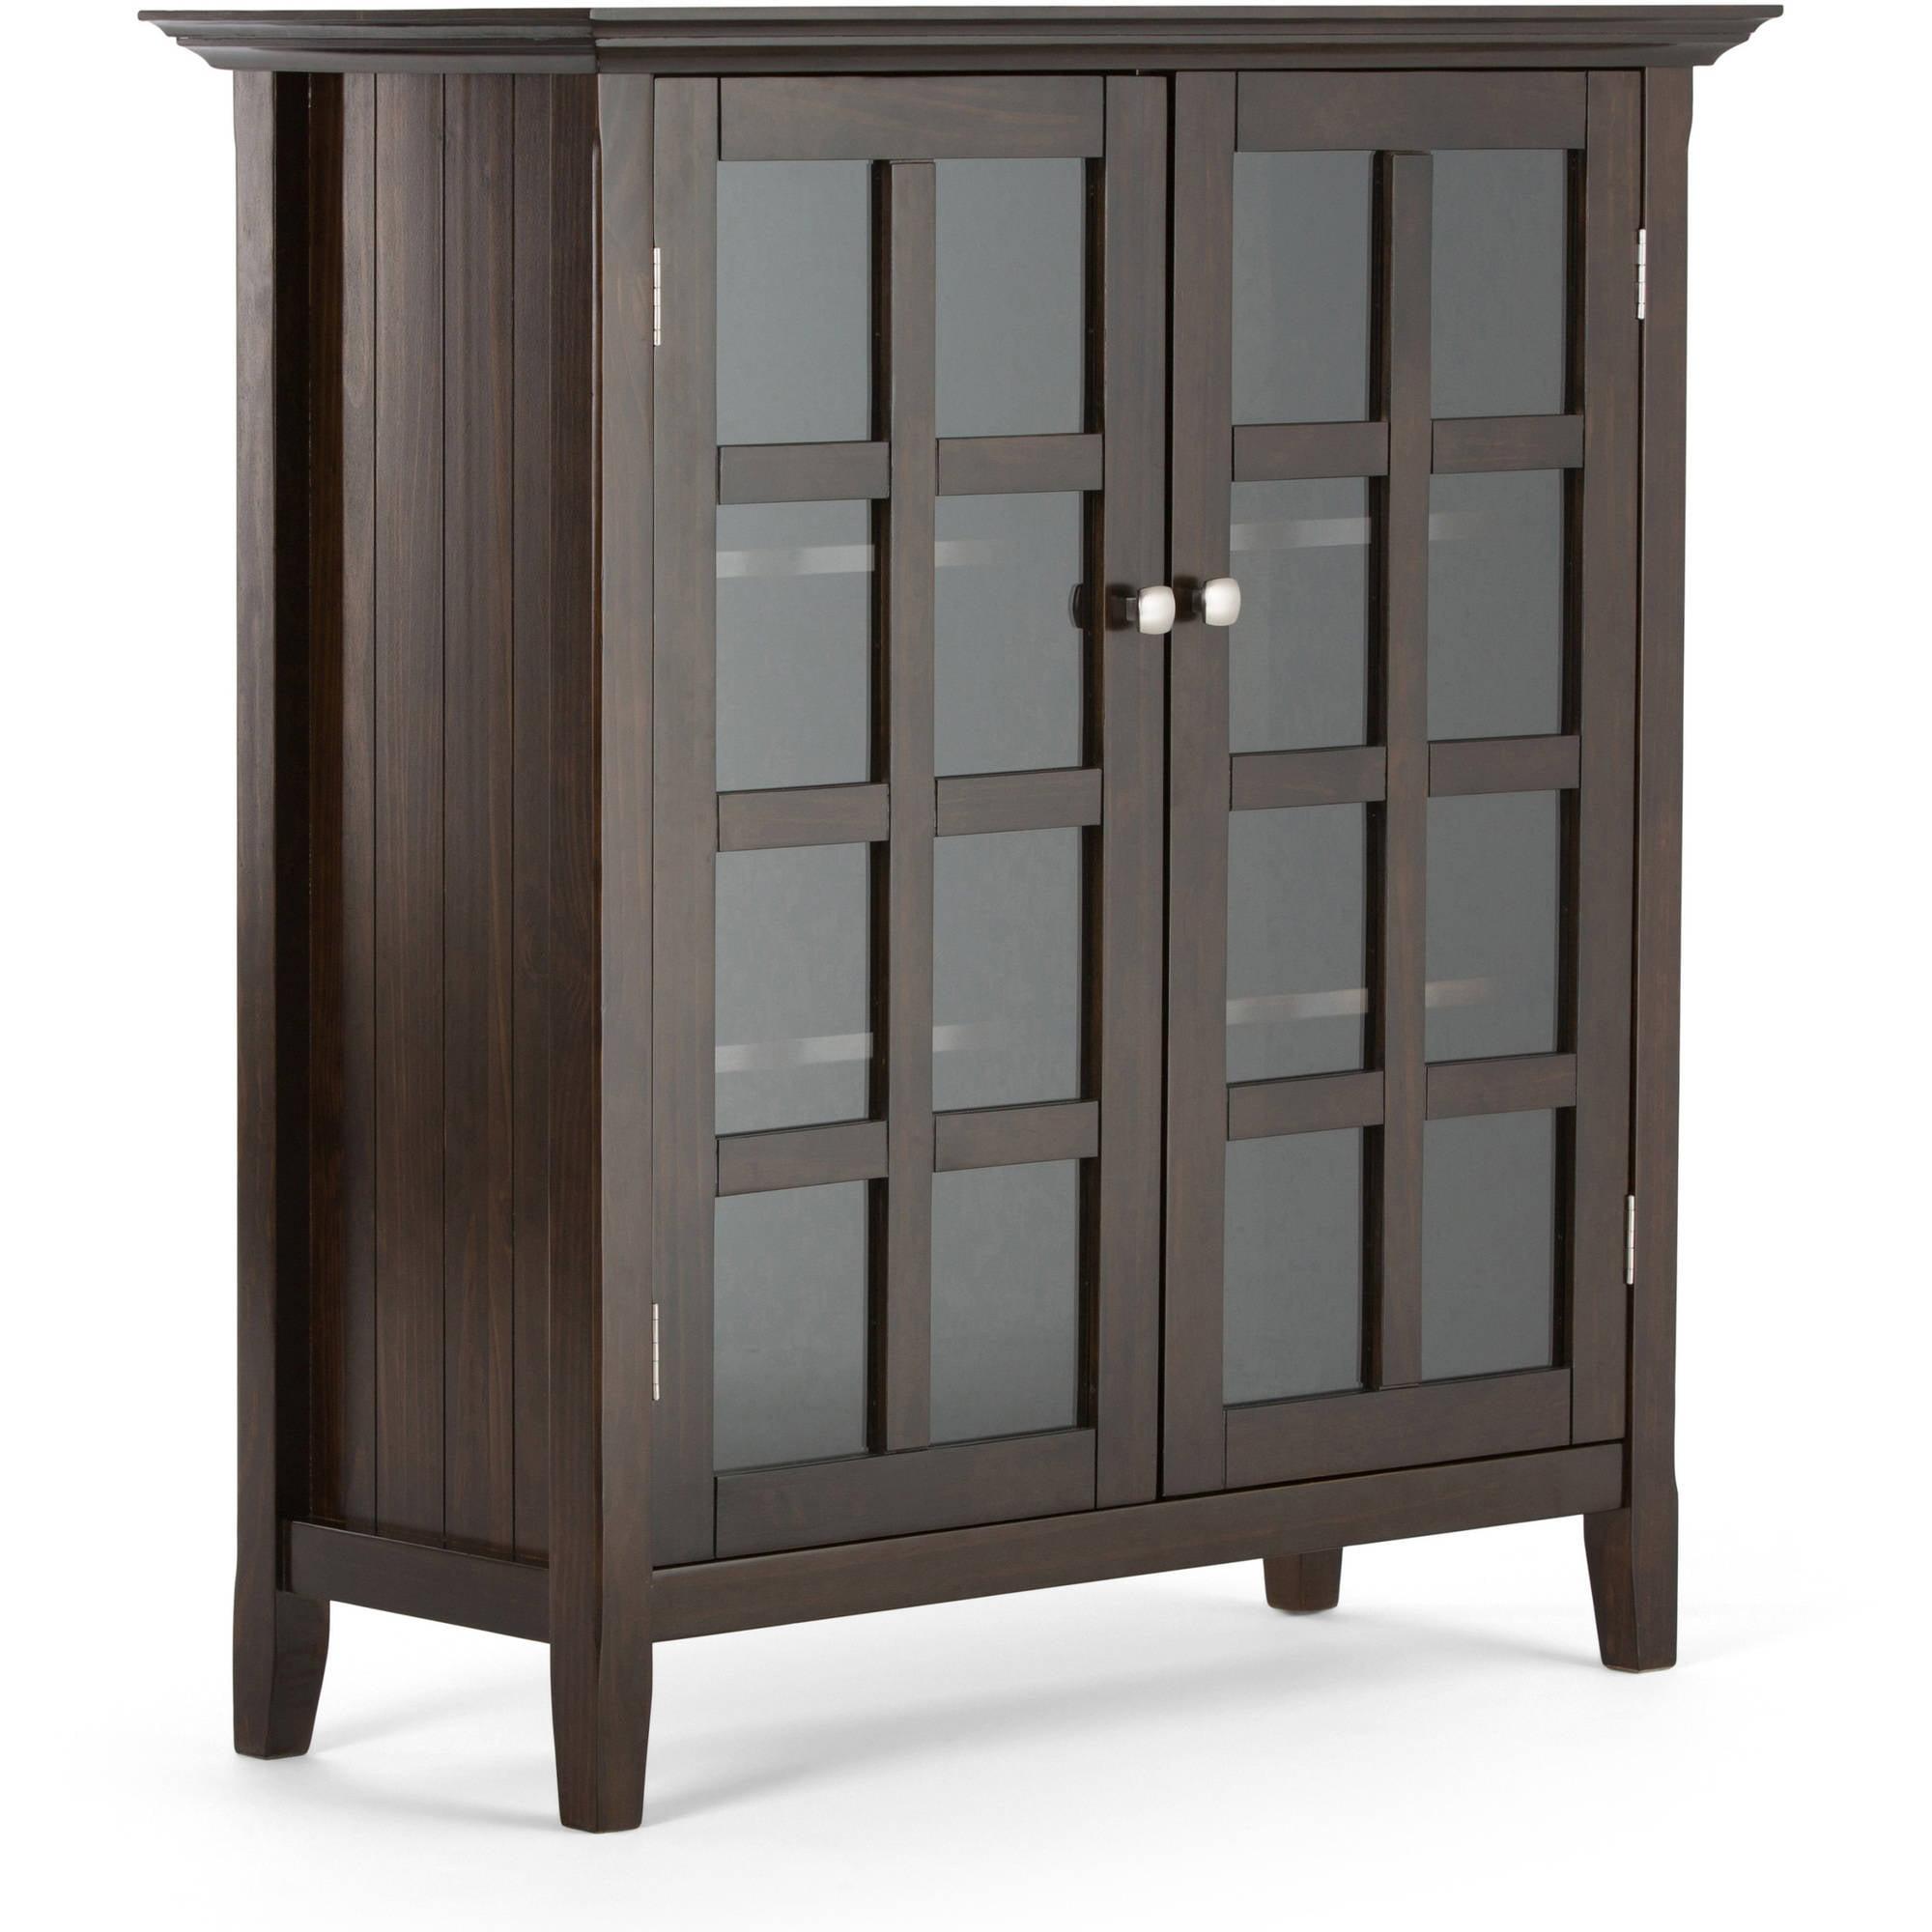 Ann mirror insert double door single drawer wooden corner cabinet - Simpli Home Acadian Medium Storage Cabinet